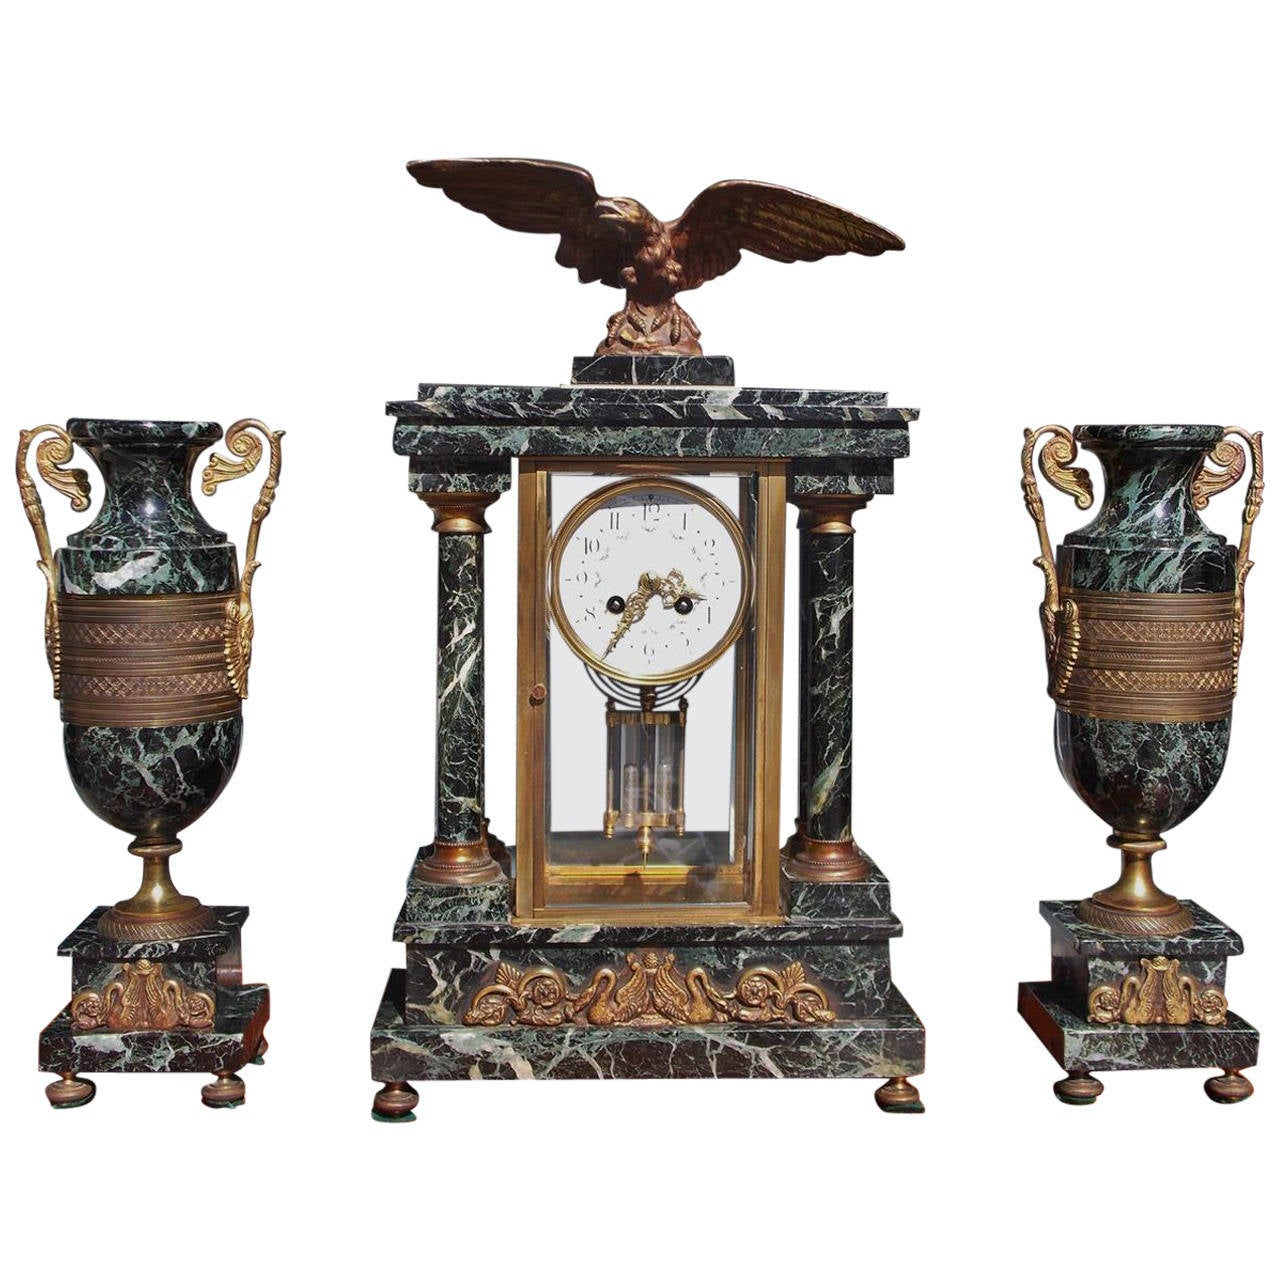 French Marble and Gilt Bronze Three Piece Mantel Clock, Circa 1840